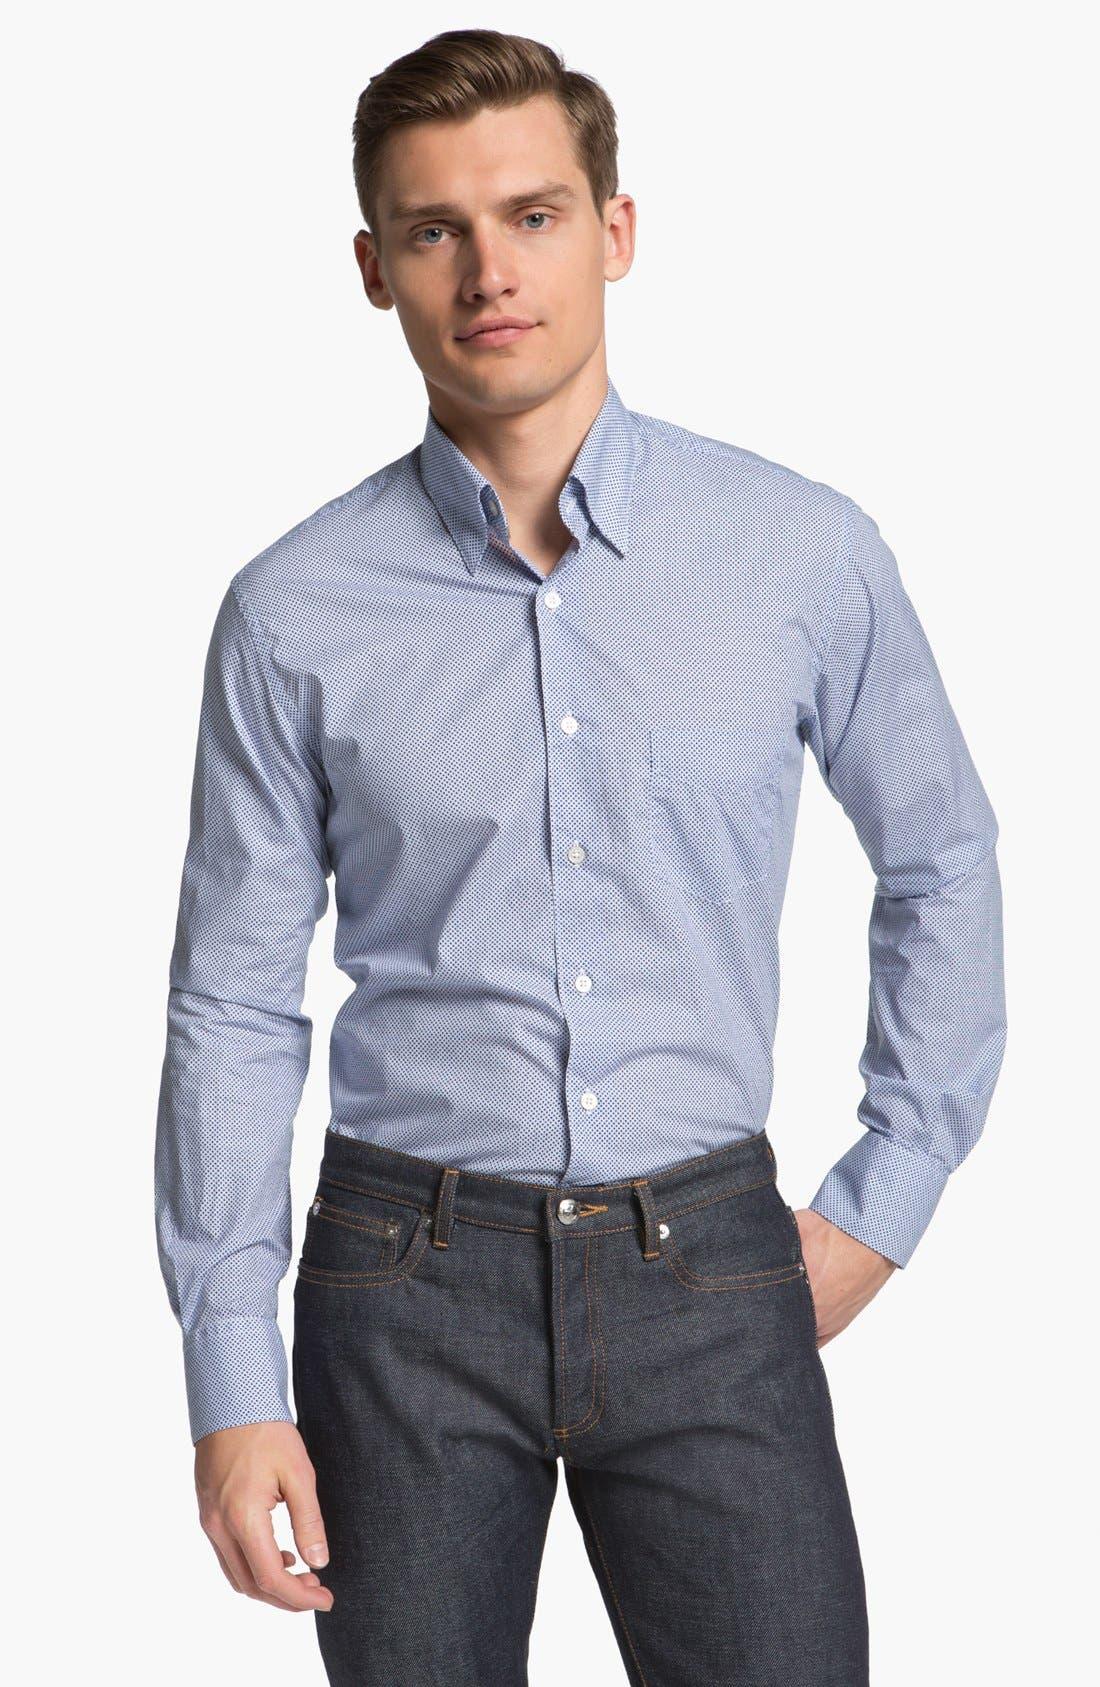 Alternate Image 1 Selected - Canali Sport Shirt